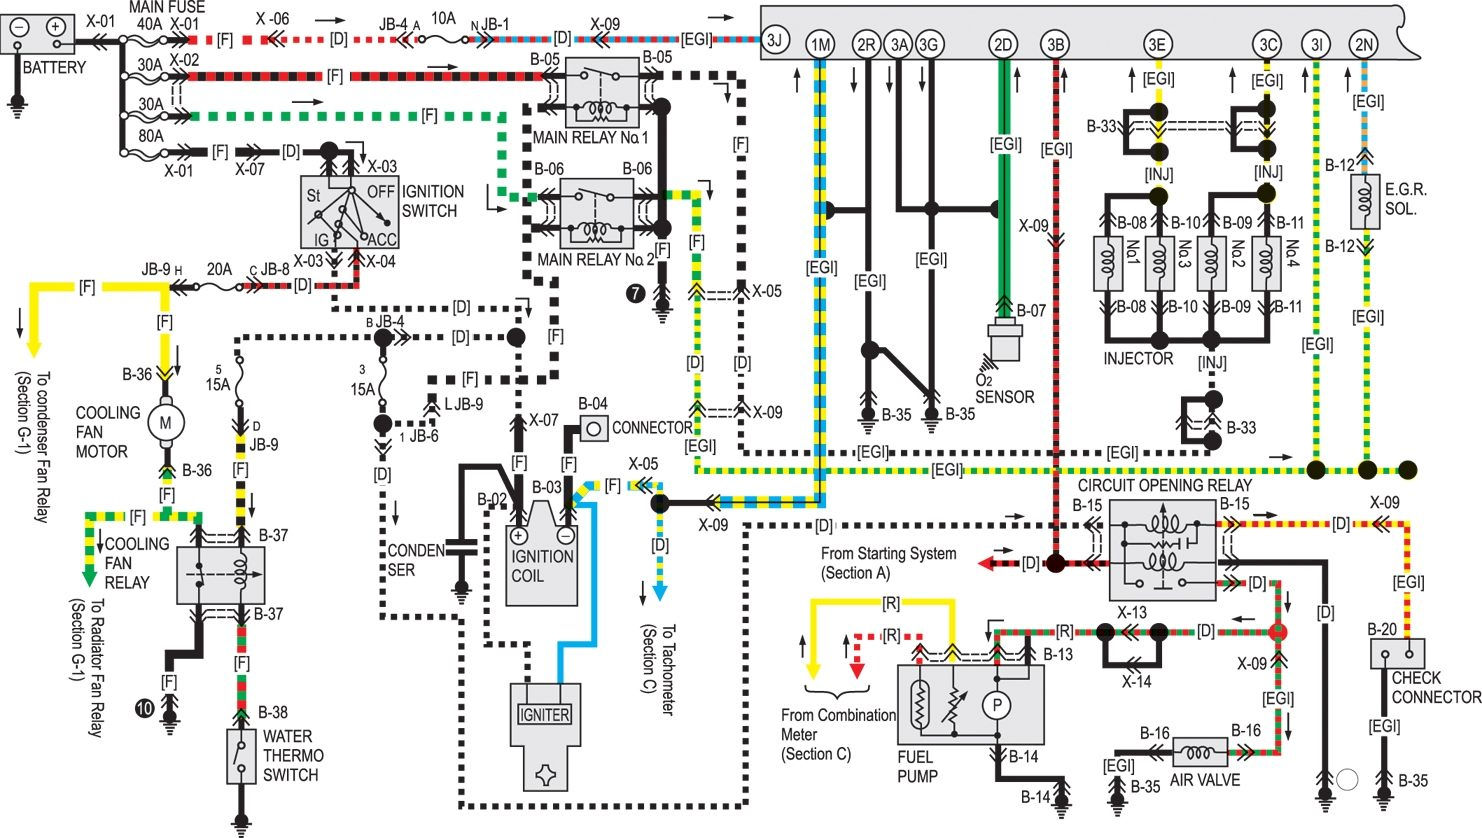 88 Mazda Alternator Wiring Diagram - Wiring Diagram on alternator plug diagram, alternator parts, alternator fuse diagram, 13av60kg011 parts diagram, car alternator diagram, gm alternator diagram, generator diagram, how alternator works diagram, alternator relay diagram, alternator generator, toyota alternator diagram, dodge alternator diagram, alternator engine diagram, alternator winding diagram, alternator charging system, alternator replacement, ford alternator diagram, alex anderson alternator diagram, ac compressor wire diagram, alternator connector diagram,